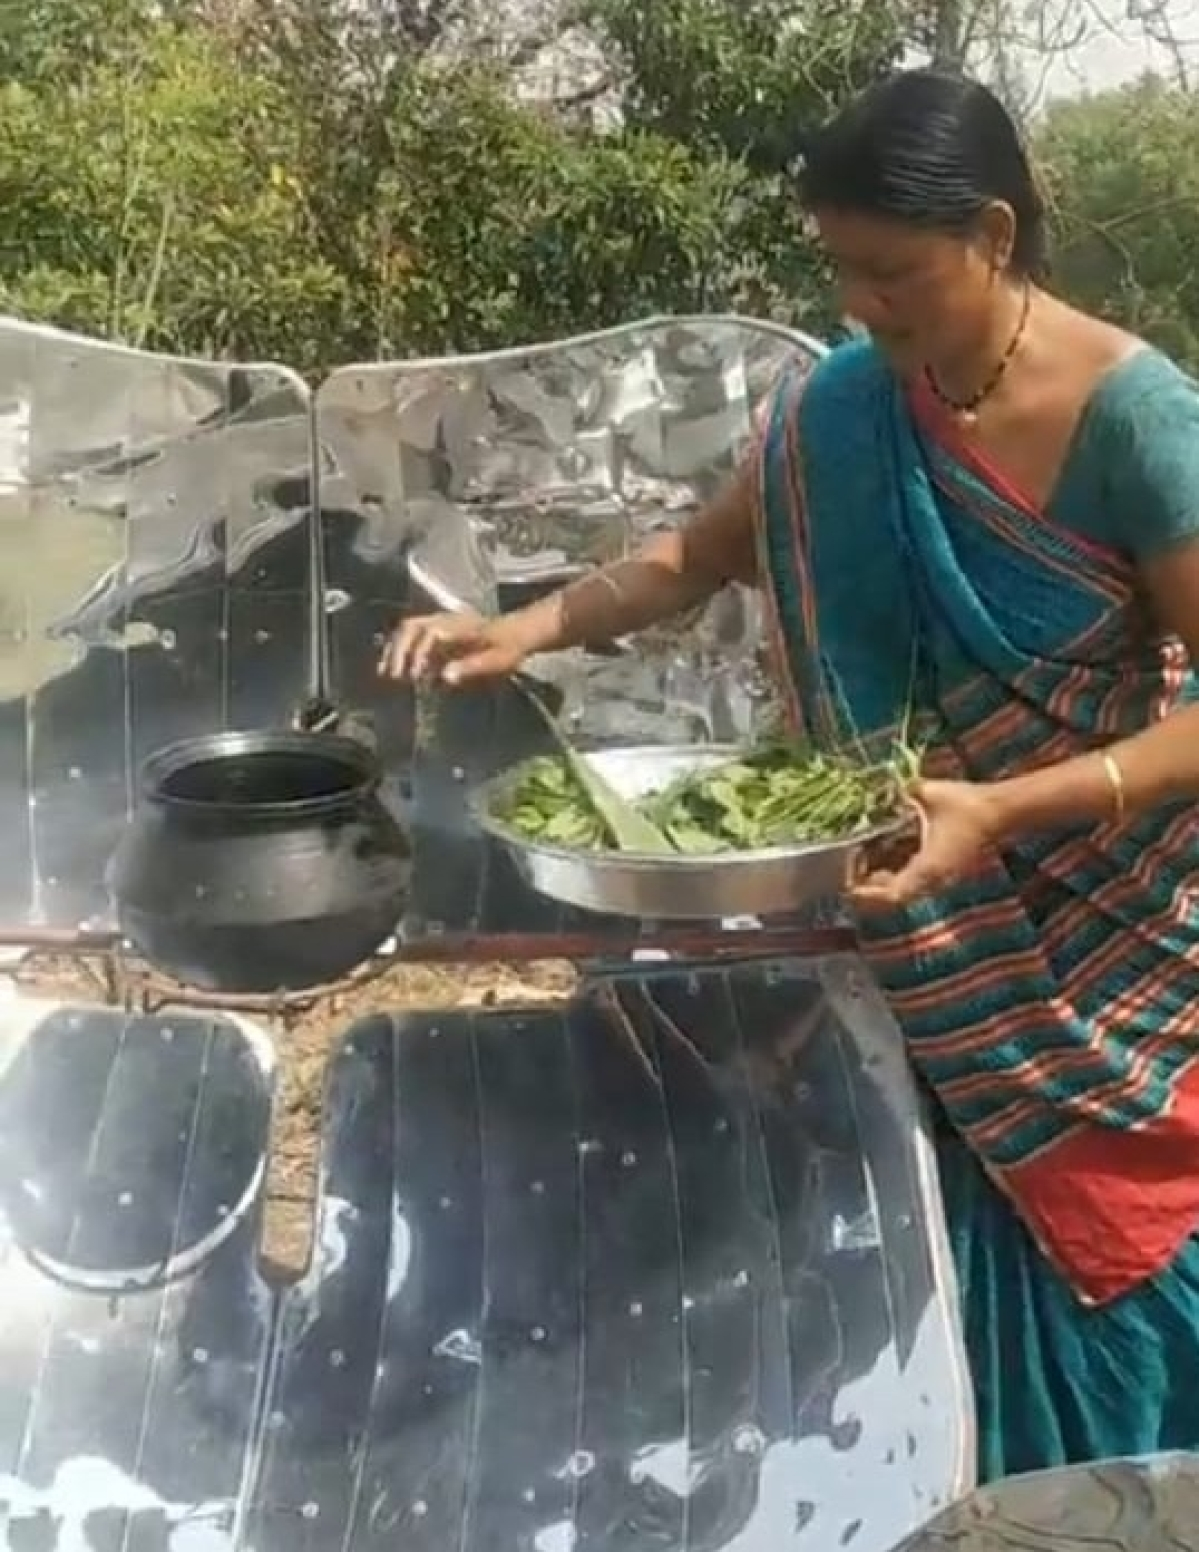 Solar cooking in progress